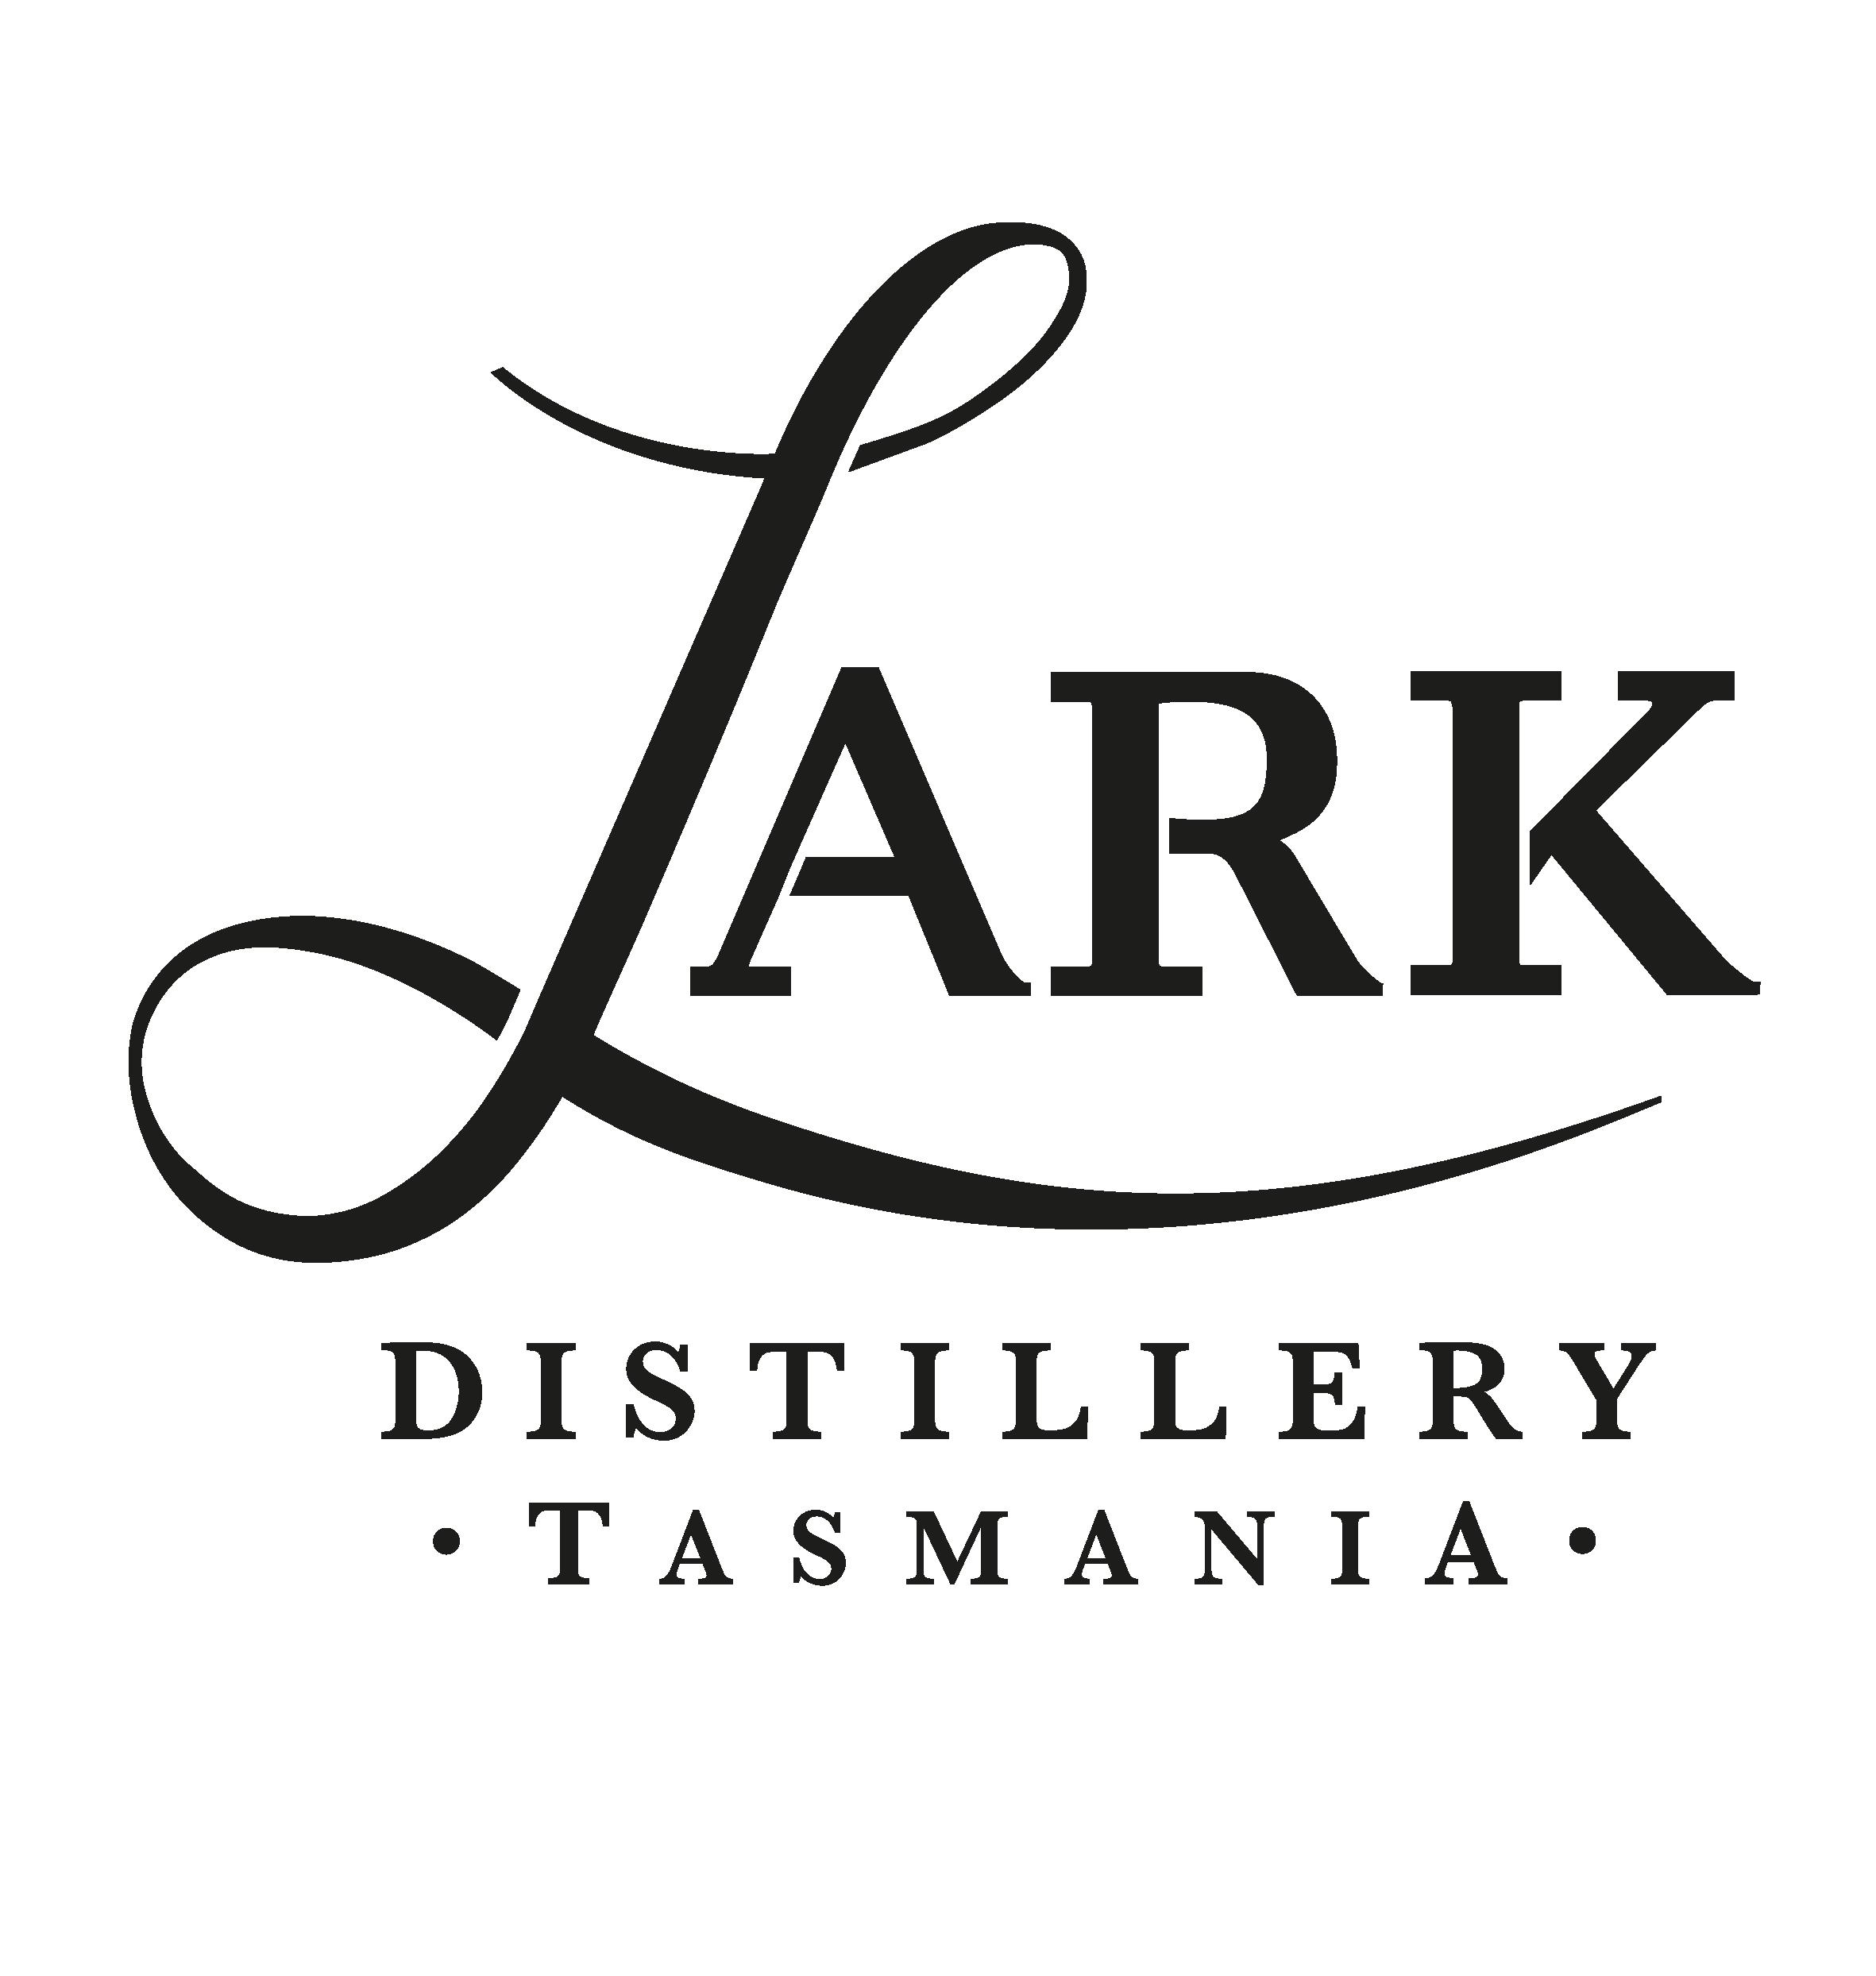 Lark Distillery Tasmania Singapore